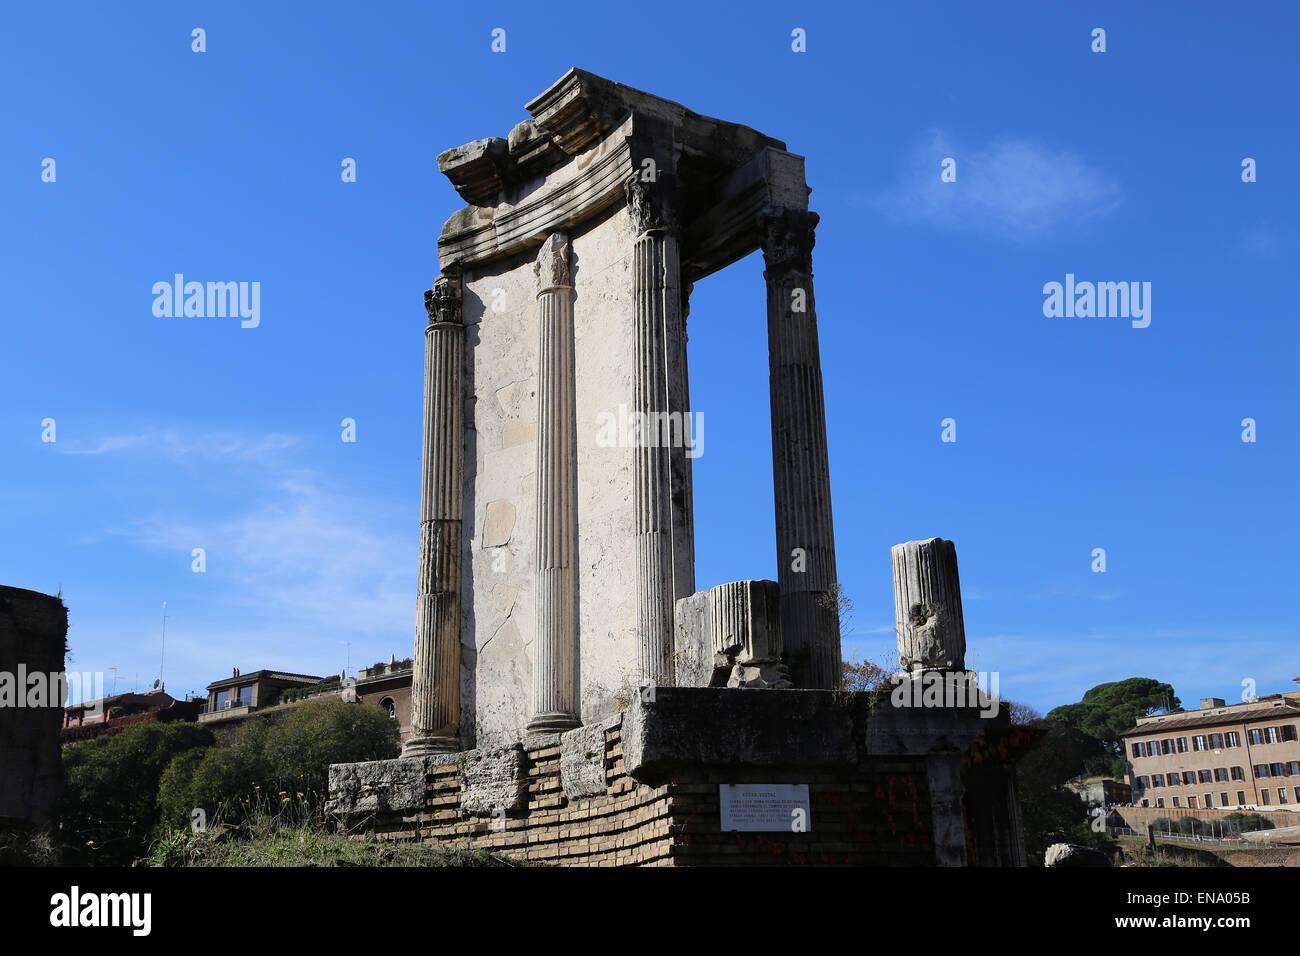 L'Italie. Rome. Forum romain. Temple de Vesta. L'Ancien Empire romain. Photo Stock